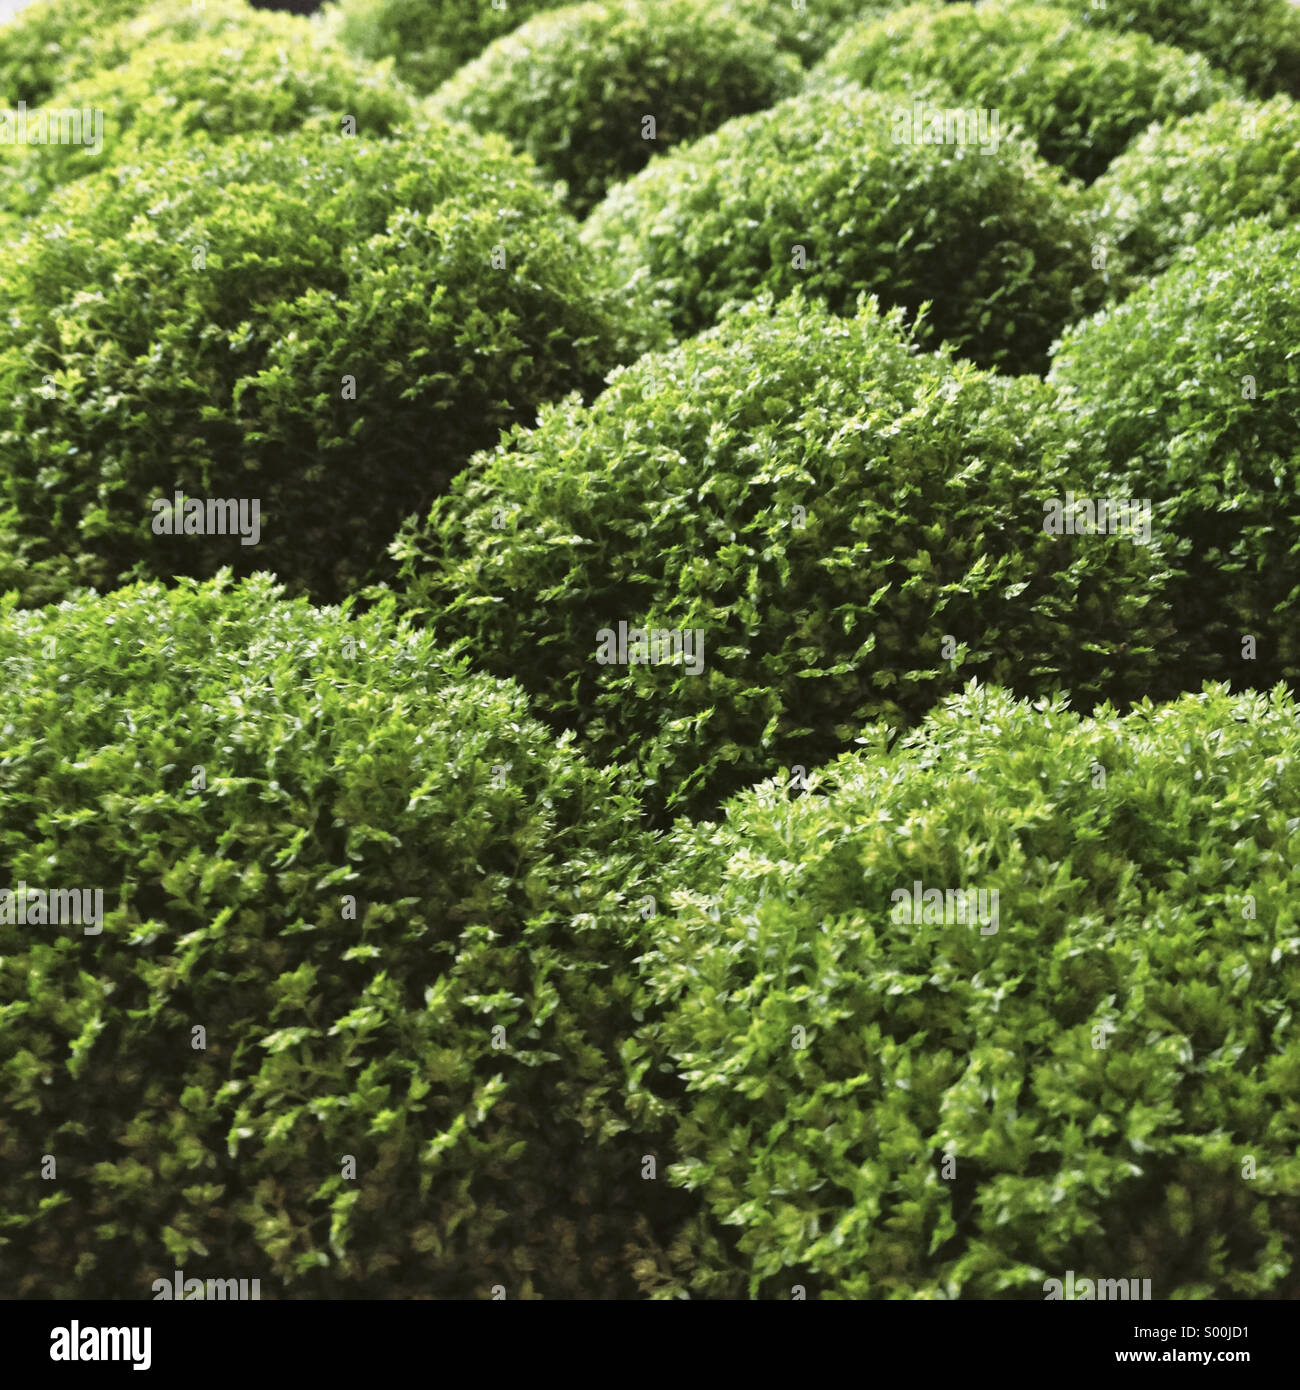 Arbusto ornamental Imagen De Stock